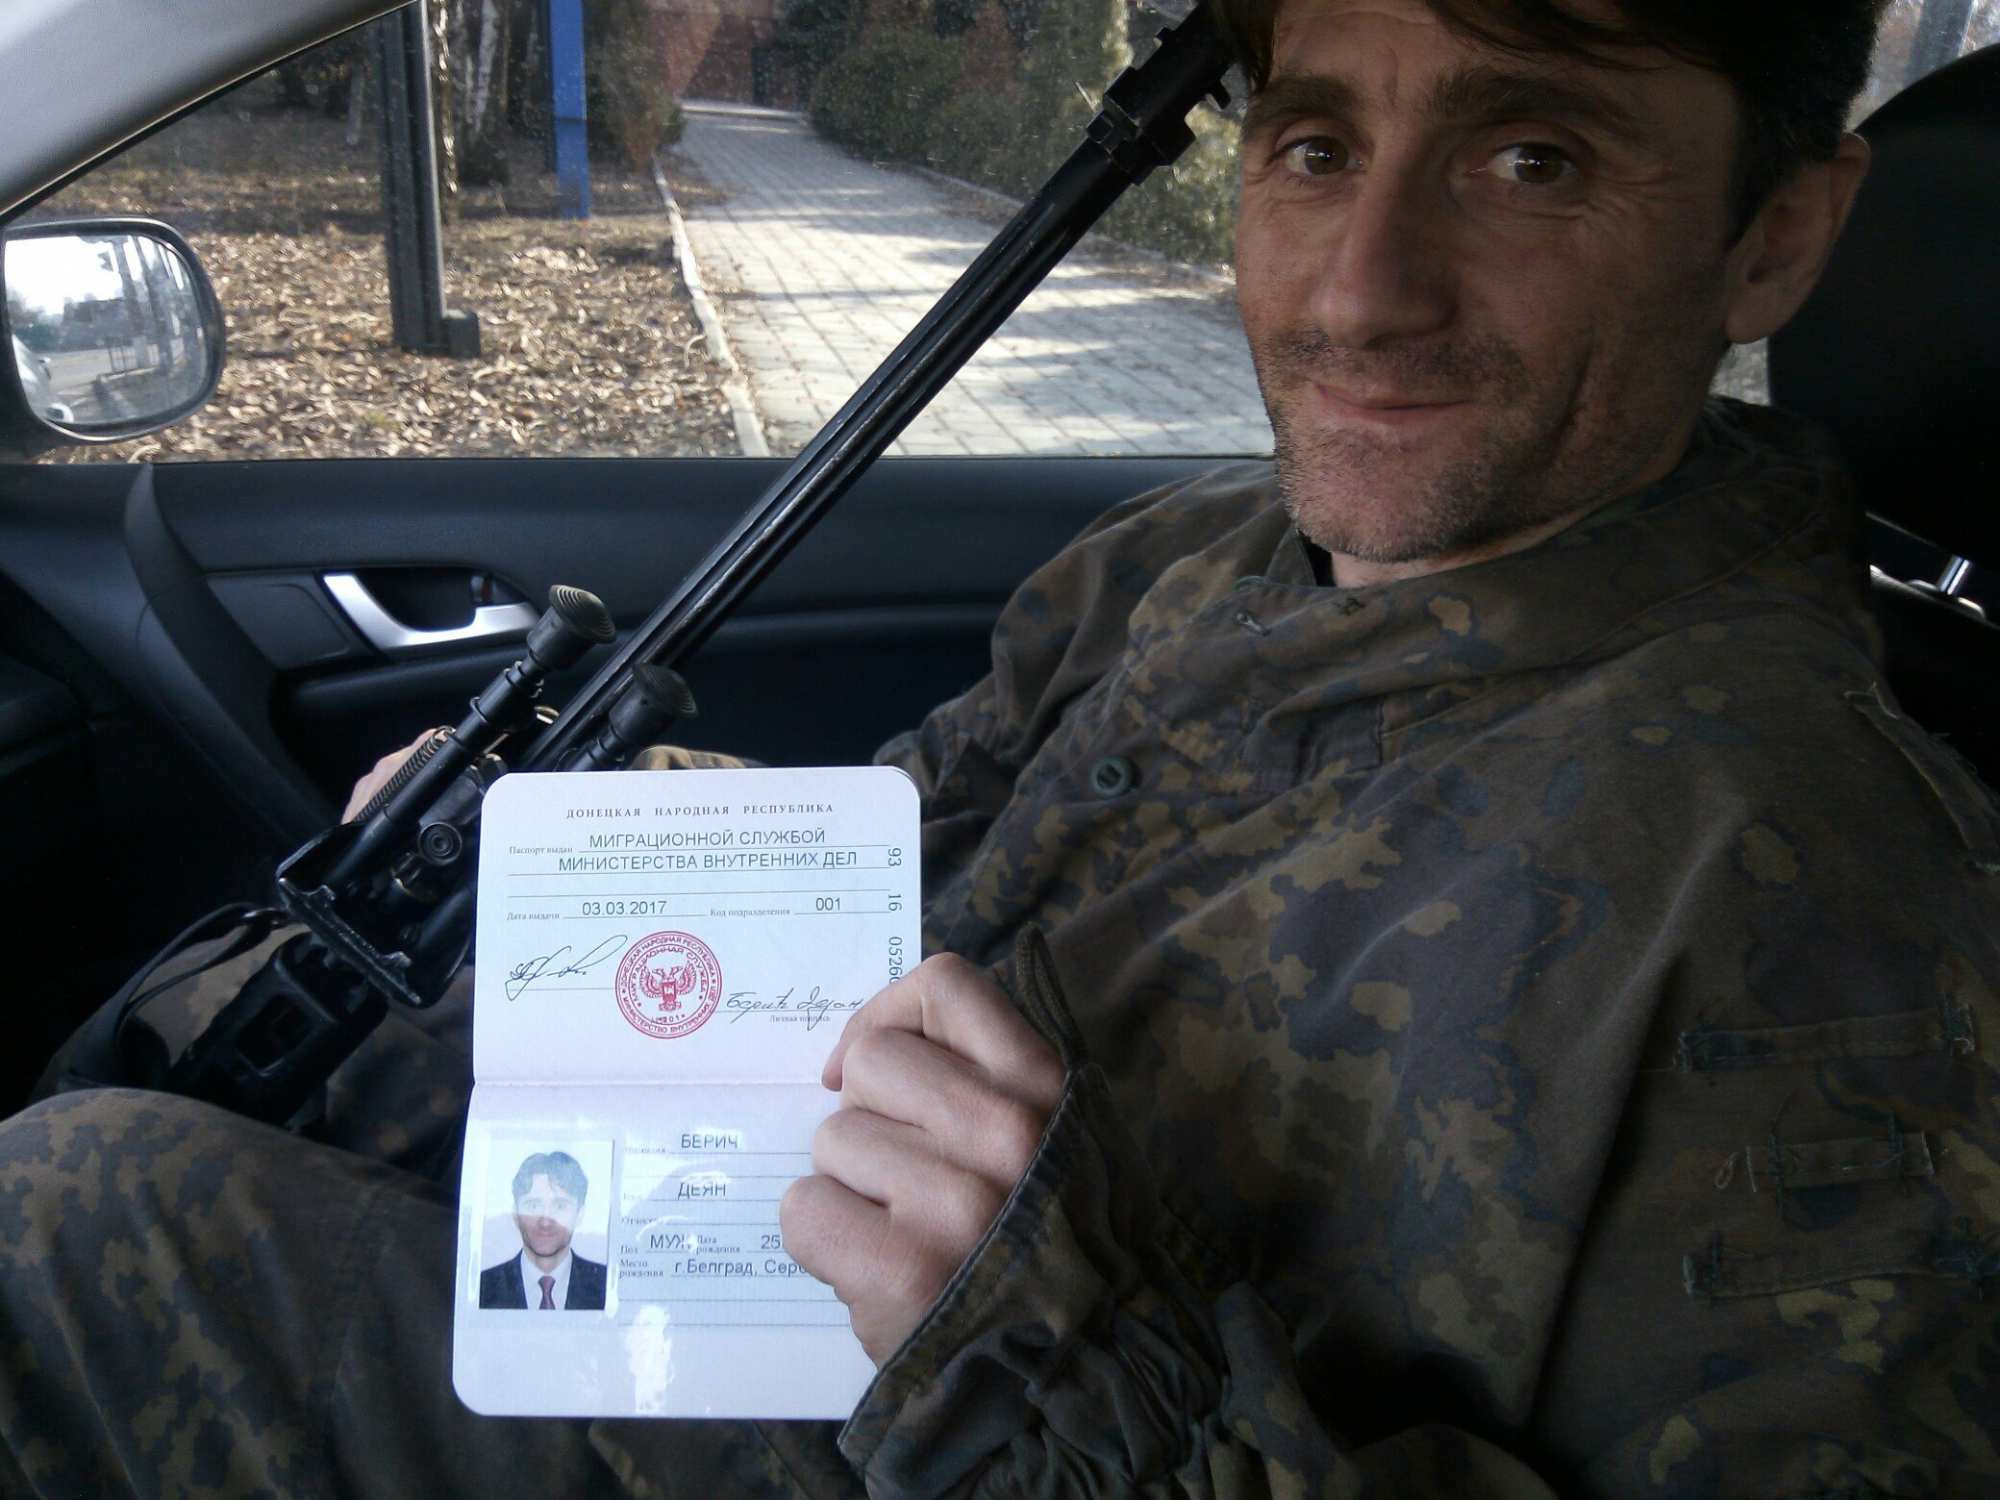 Сербский доброволец Деки получил паспорт ДНР (ФОТО) | Русская весна